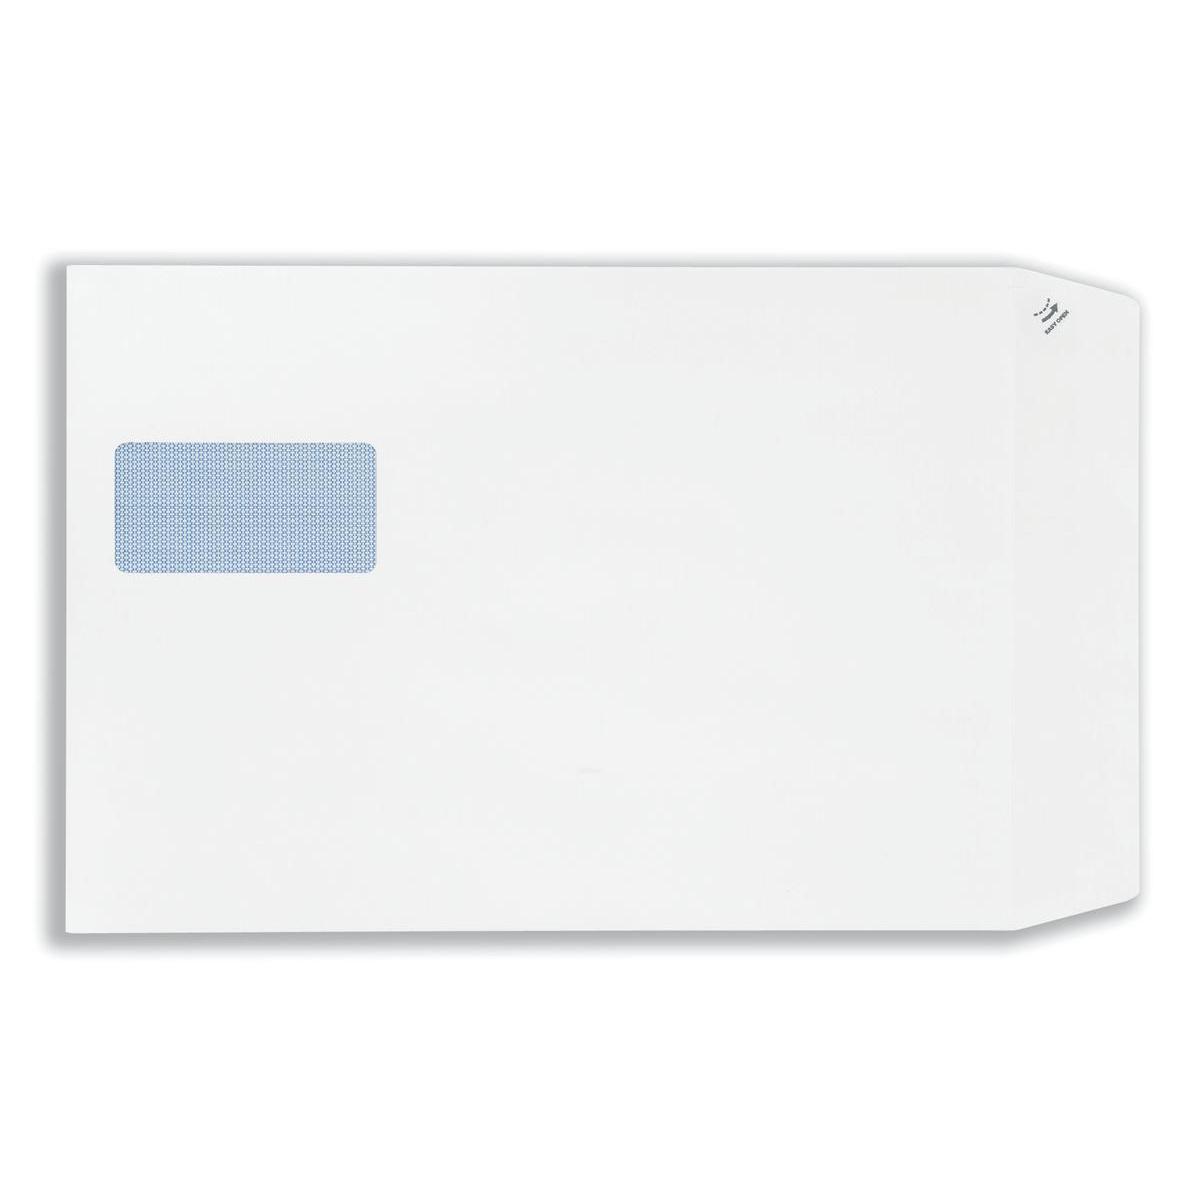 Plus Fabric Envelopes PEFC Pocket Peel & Seal Hrzntal Wdw 120gsm C4 324x229mm White Ref F28749 Pack 250